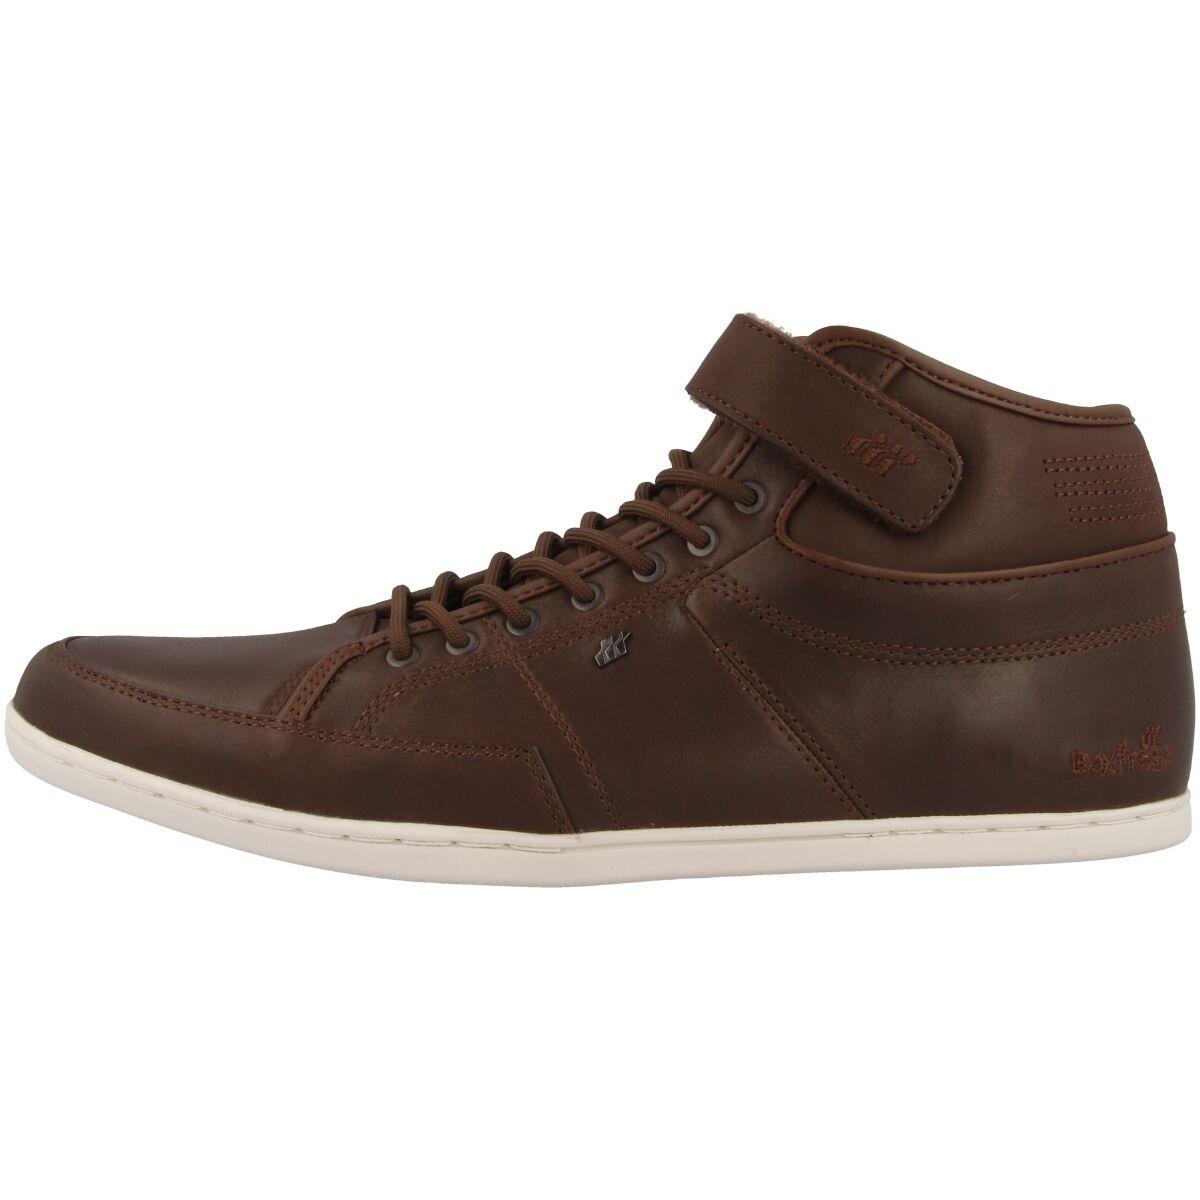 Boxfresh Swich Zapatos PREMIUM ICN Vachetta Piel Zapatos Swich Cuero Zapatillas High Top 335aab